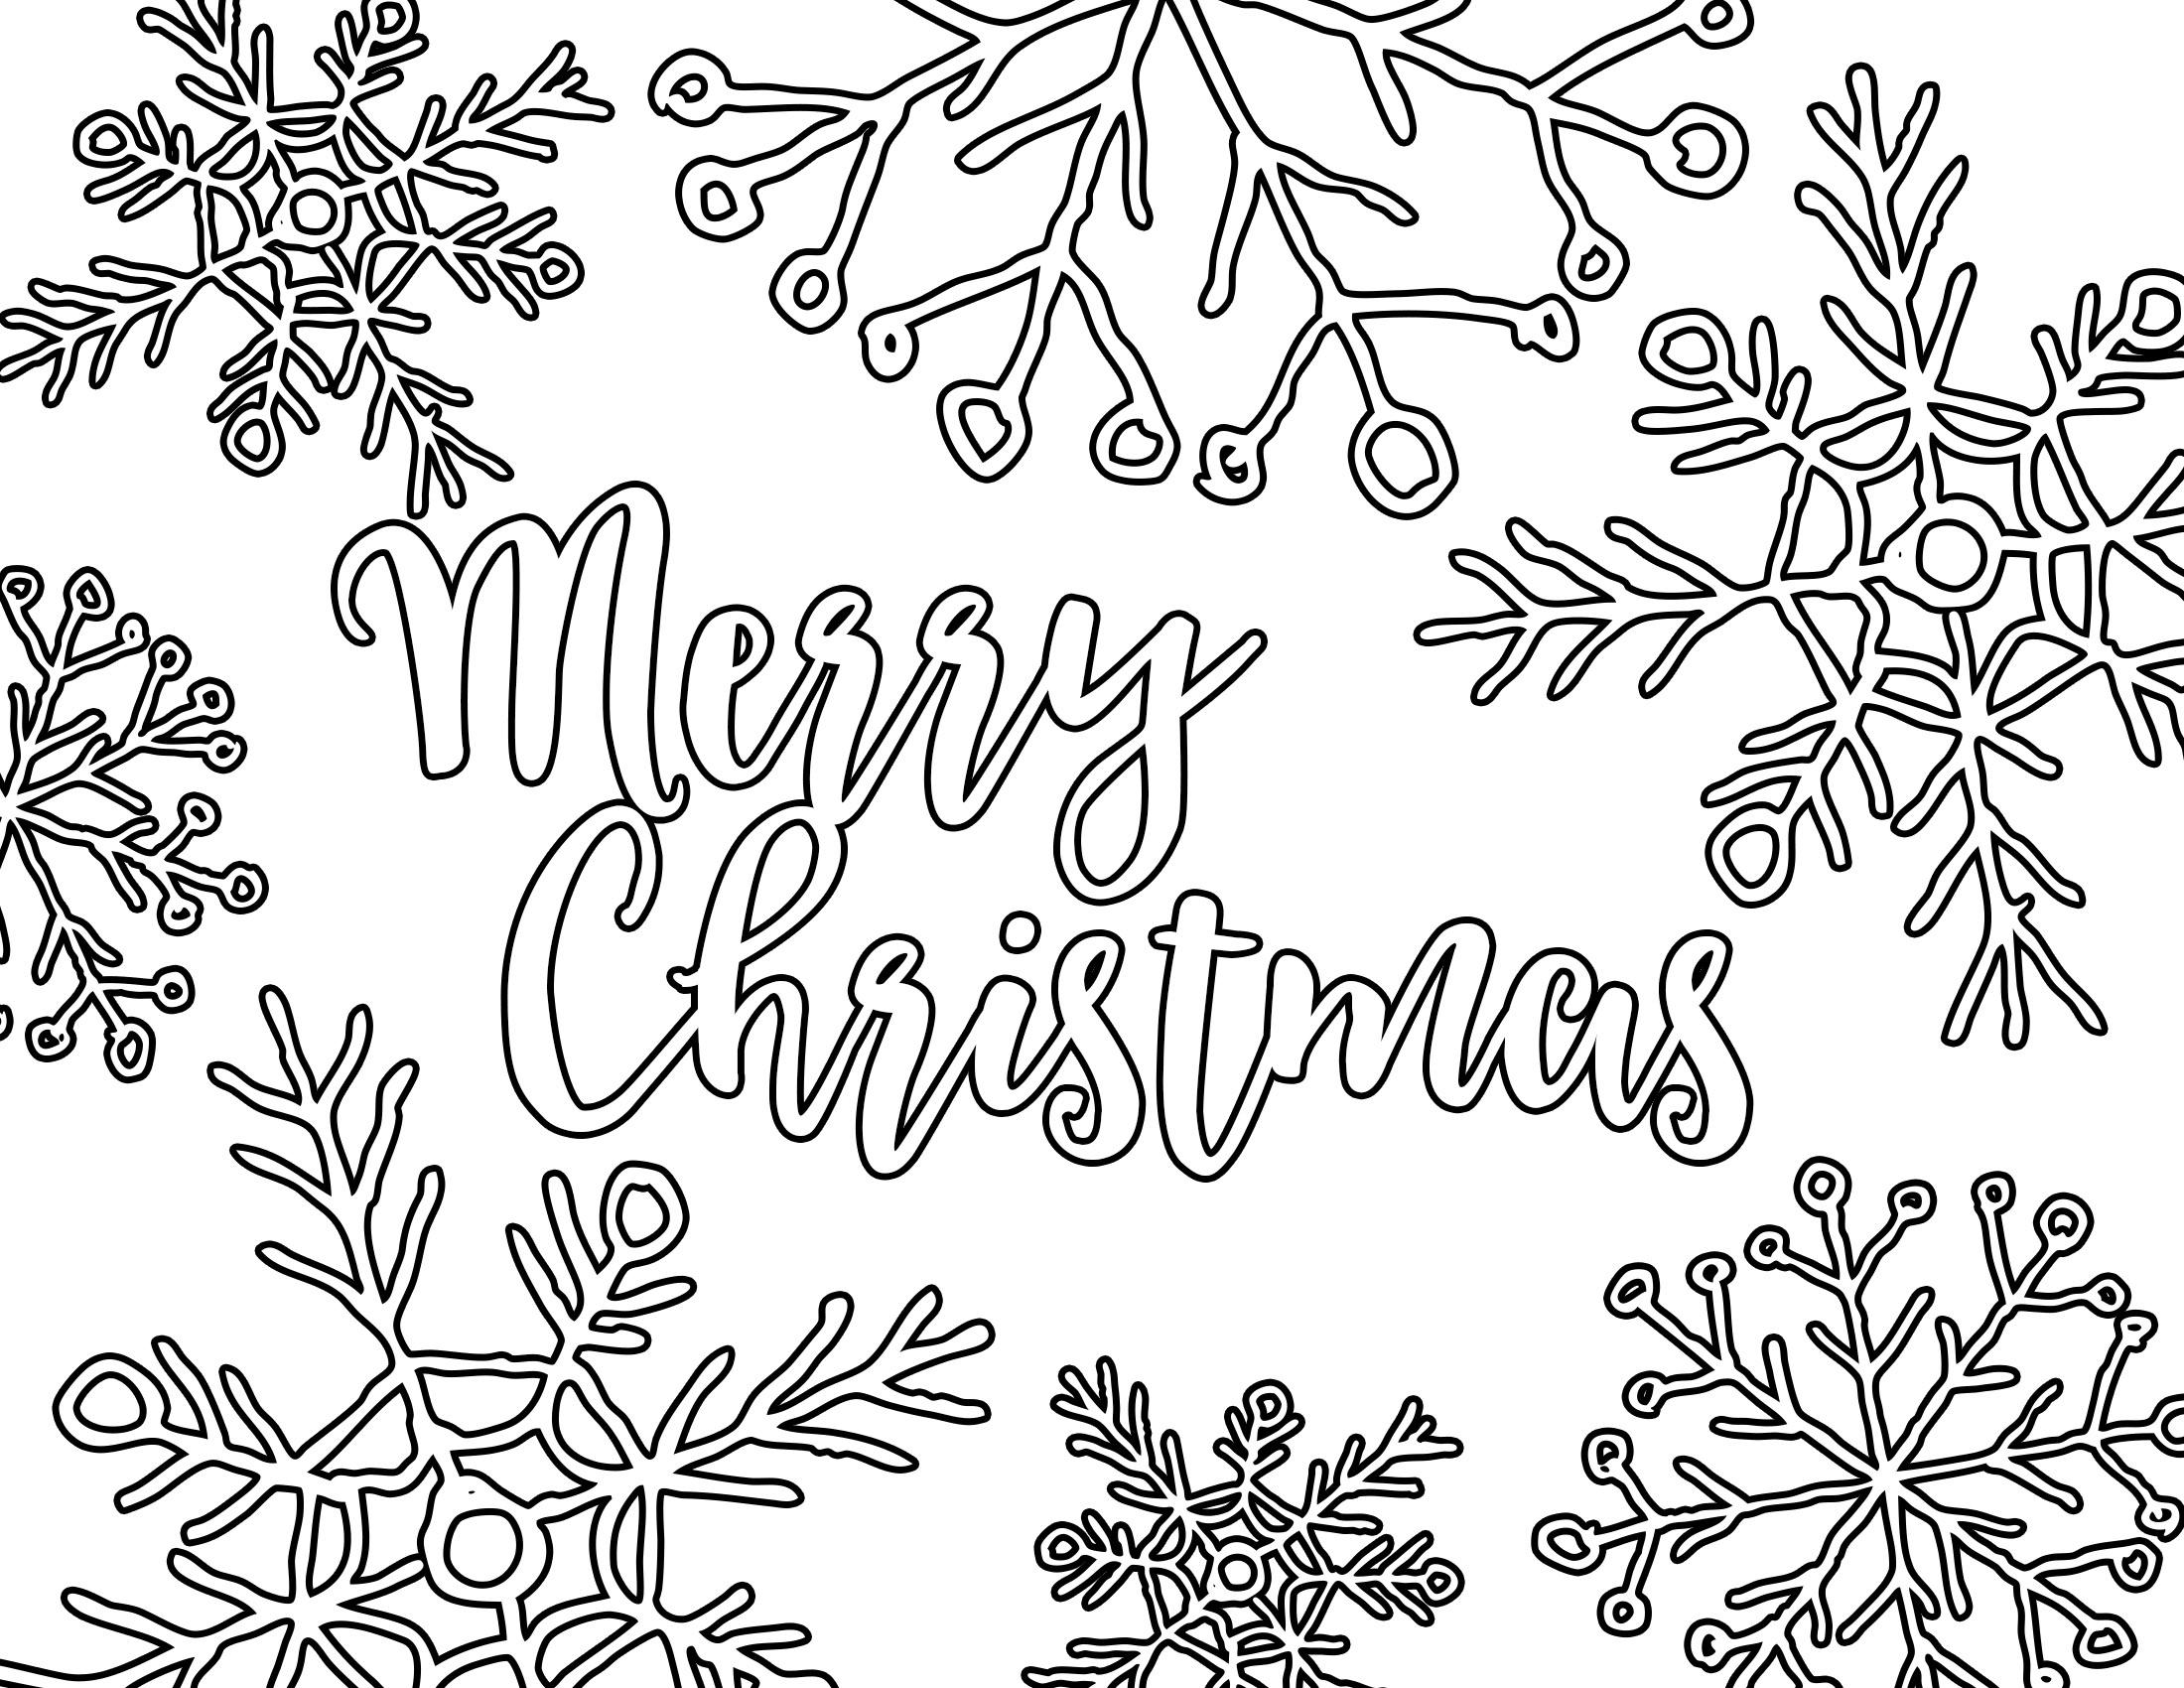 Free Printable Adult Coloring Page - Christmas Placemat - Our - Free Printable Christmas Placemats For Adults